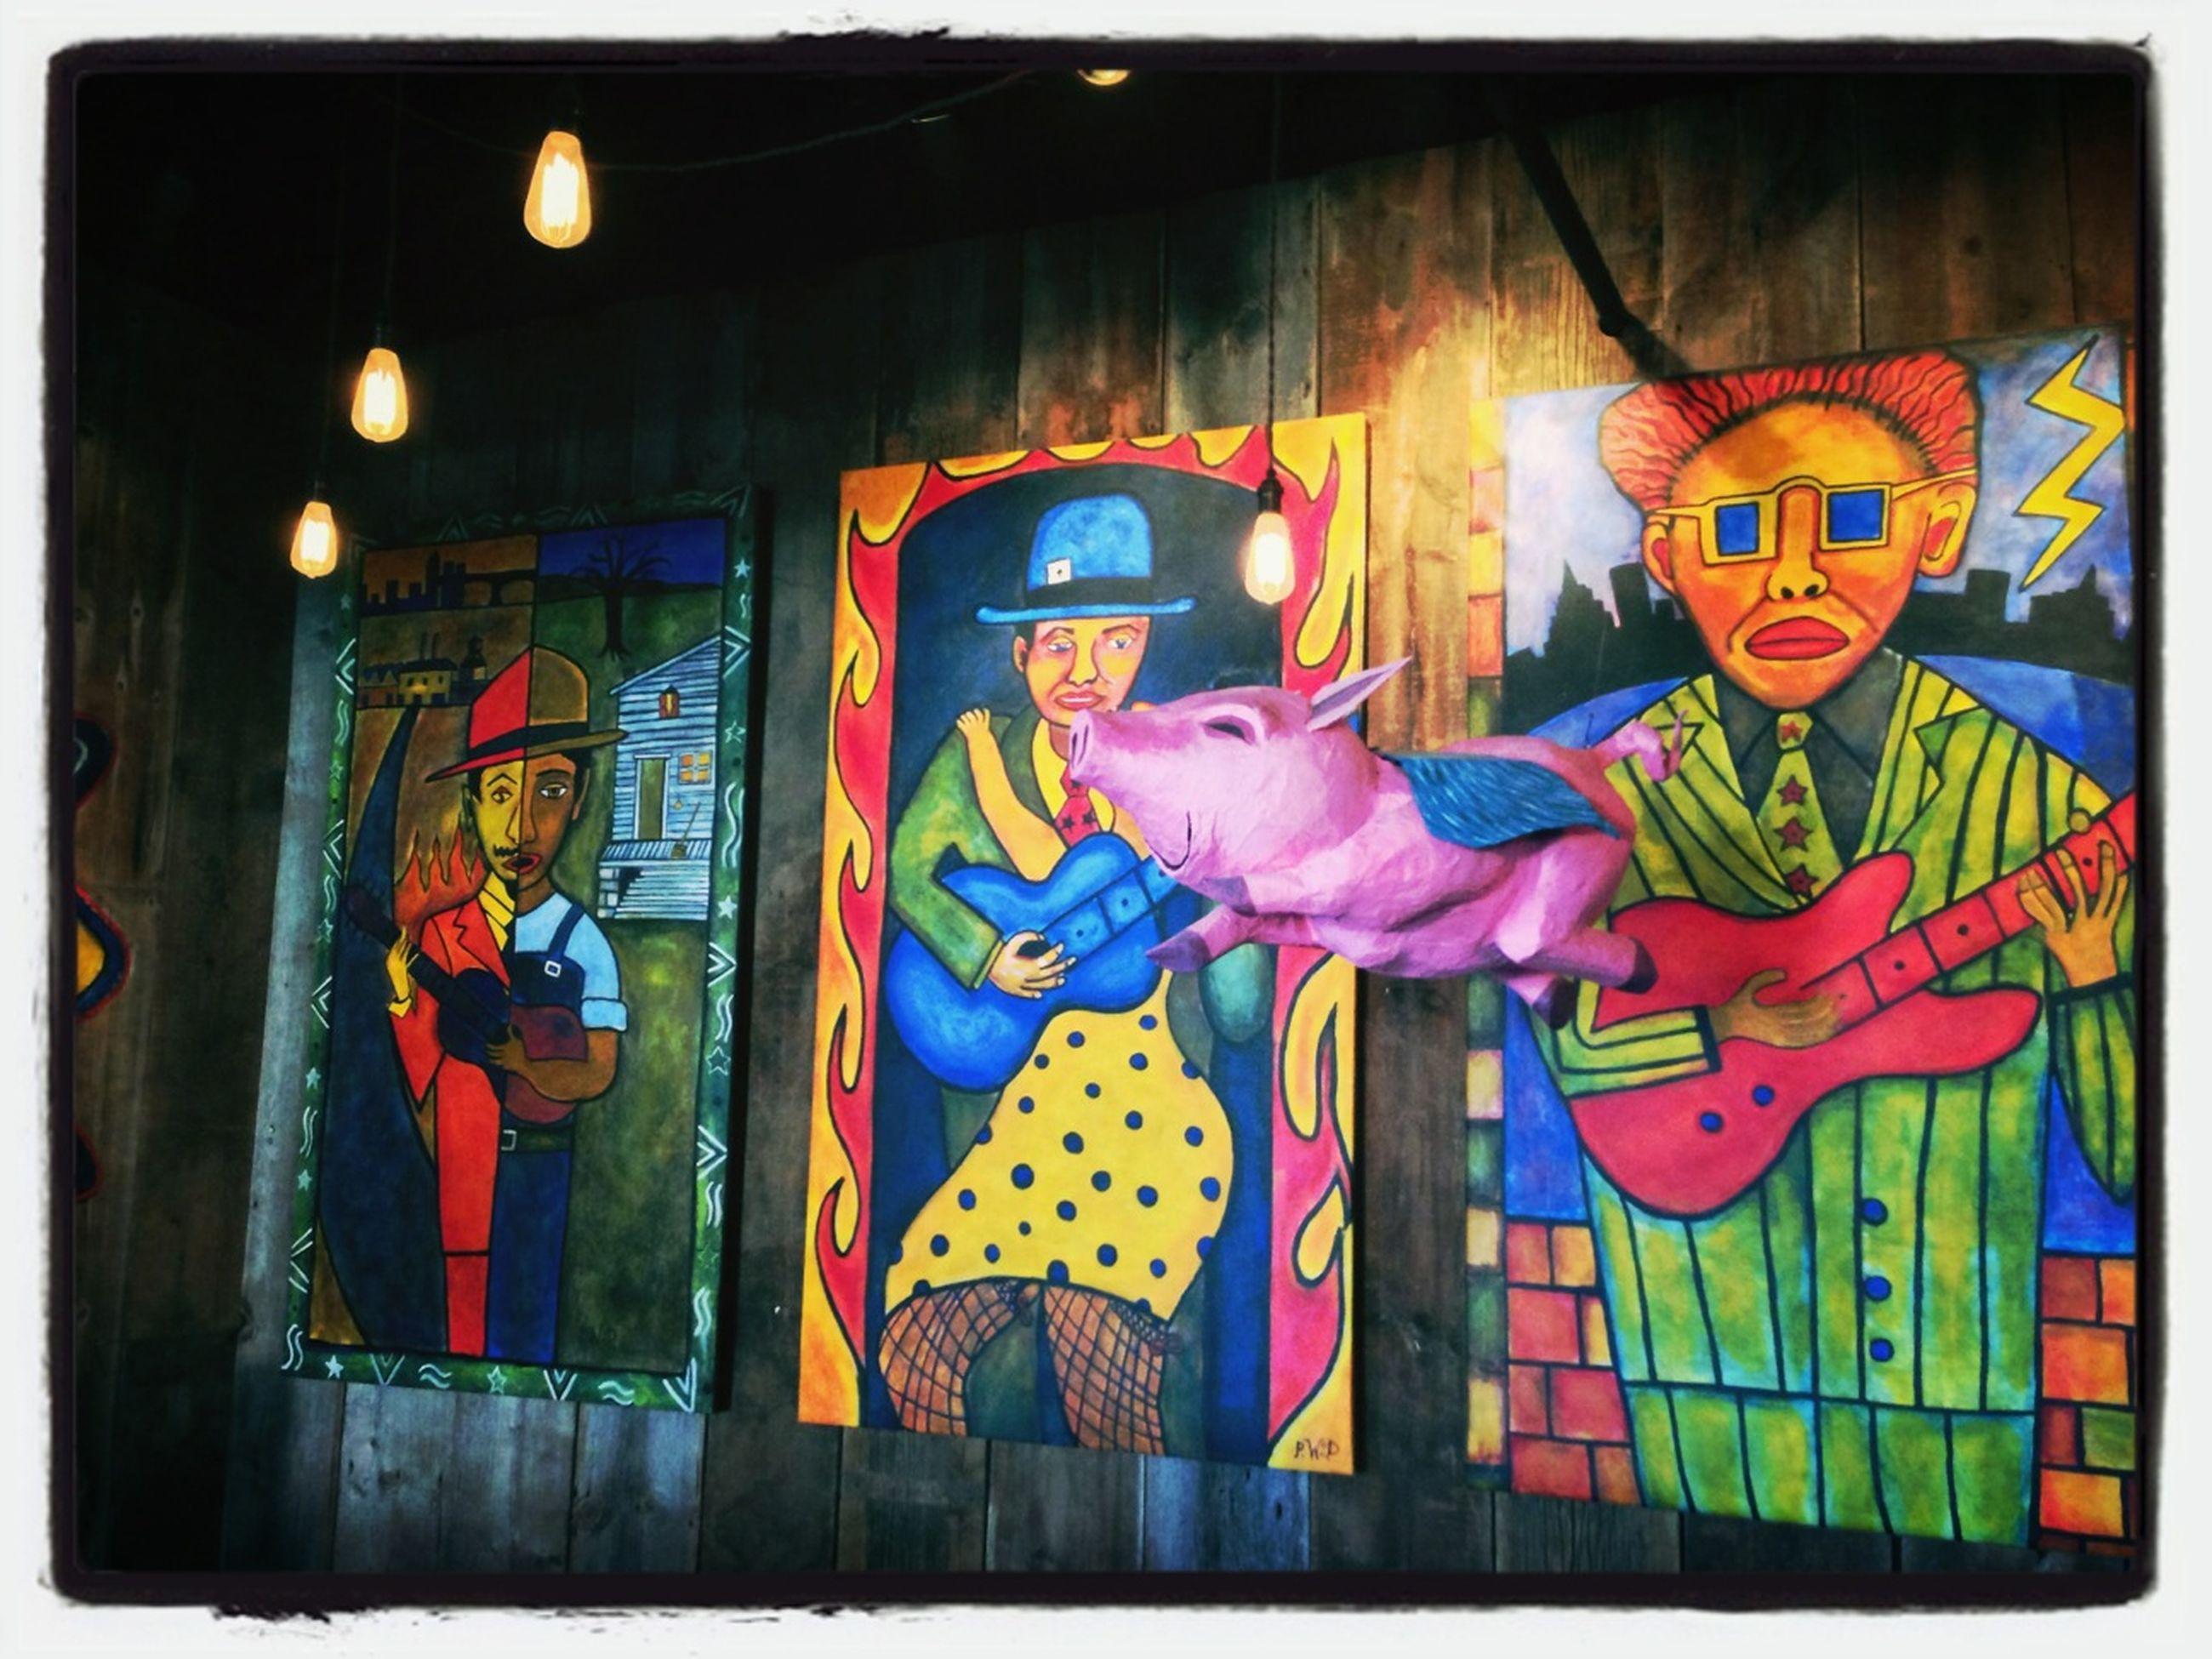 art, art and craft, creativity, transfer print, graffiti, architecture, built structure, human representation, multi colored, building exterior, auto post production filter, animal representation, wall - building feature, mural, text, street art, illuminated, western script